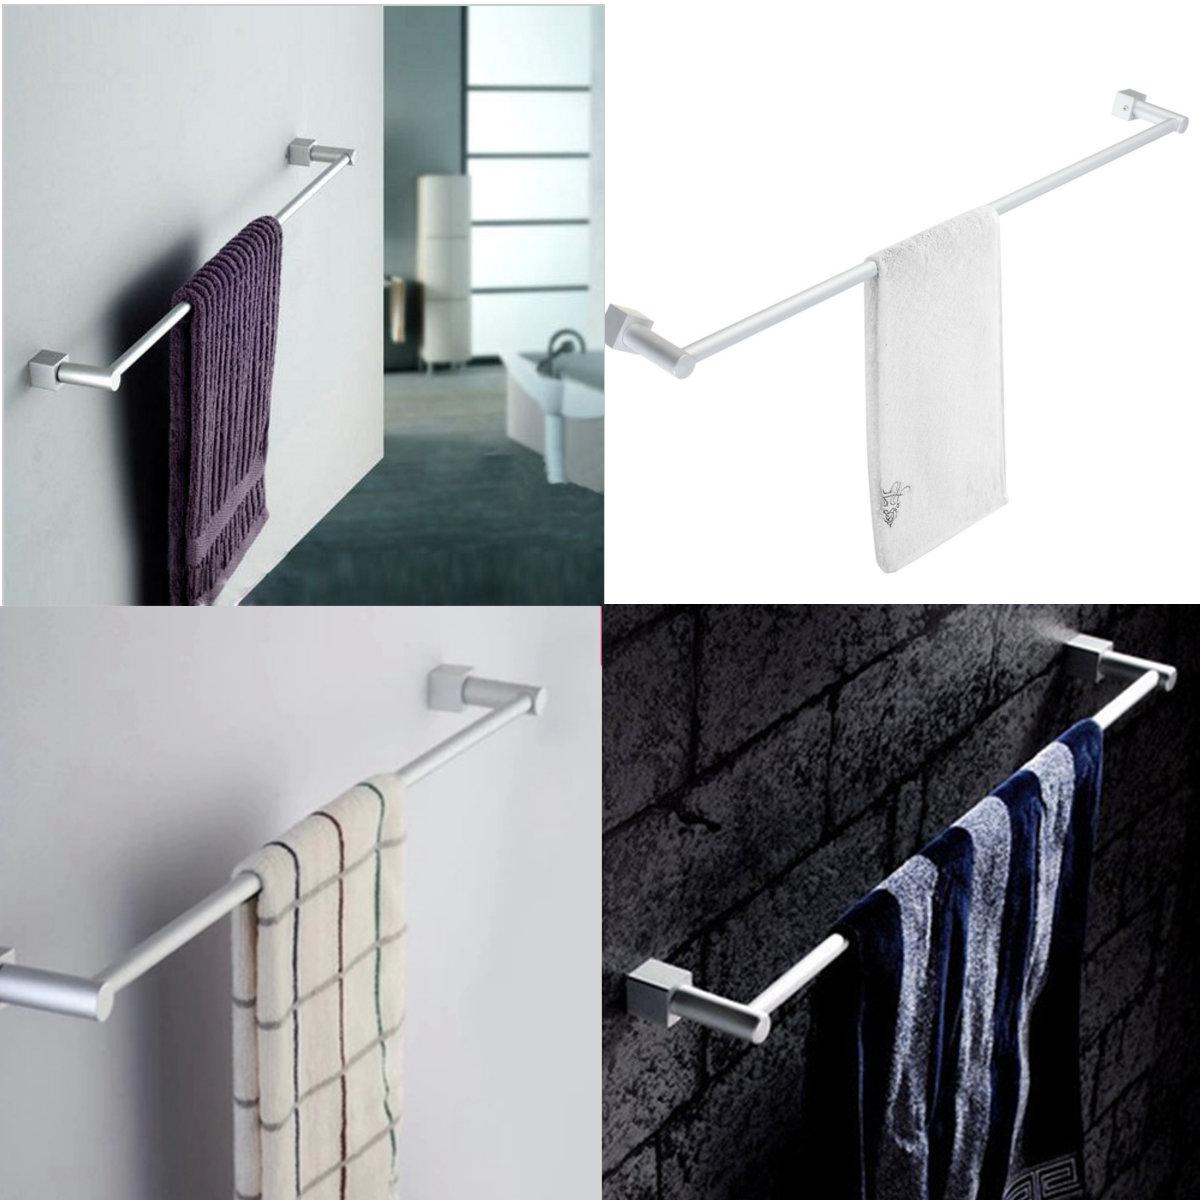 60CM HQ Aluminum Wall-Mounted Bathroom Towel Holders Hanging Rack Shelf